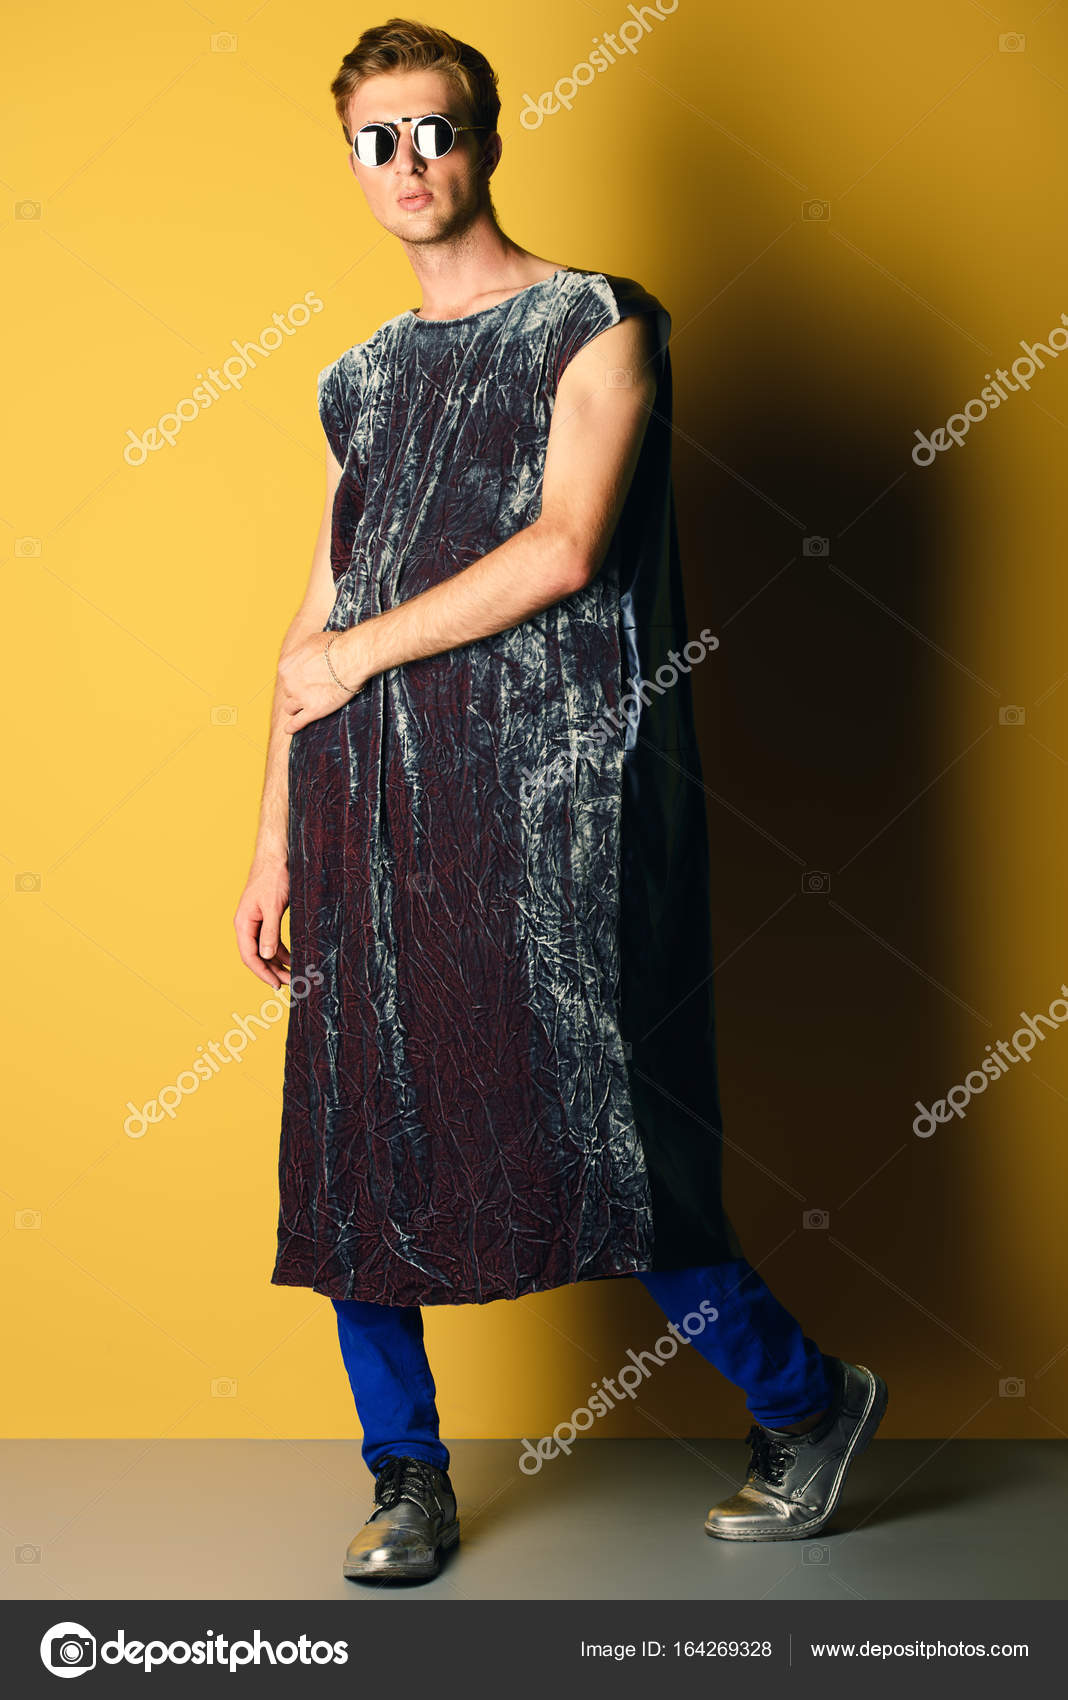 b544e0bfc6a Επώνυμα ρούχα Ανδρικά — Φωτογραφία Αρχείου © prometeus #164269328